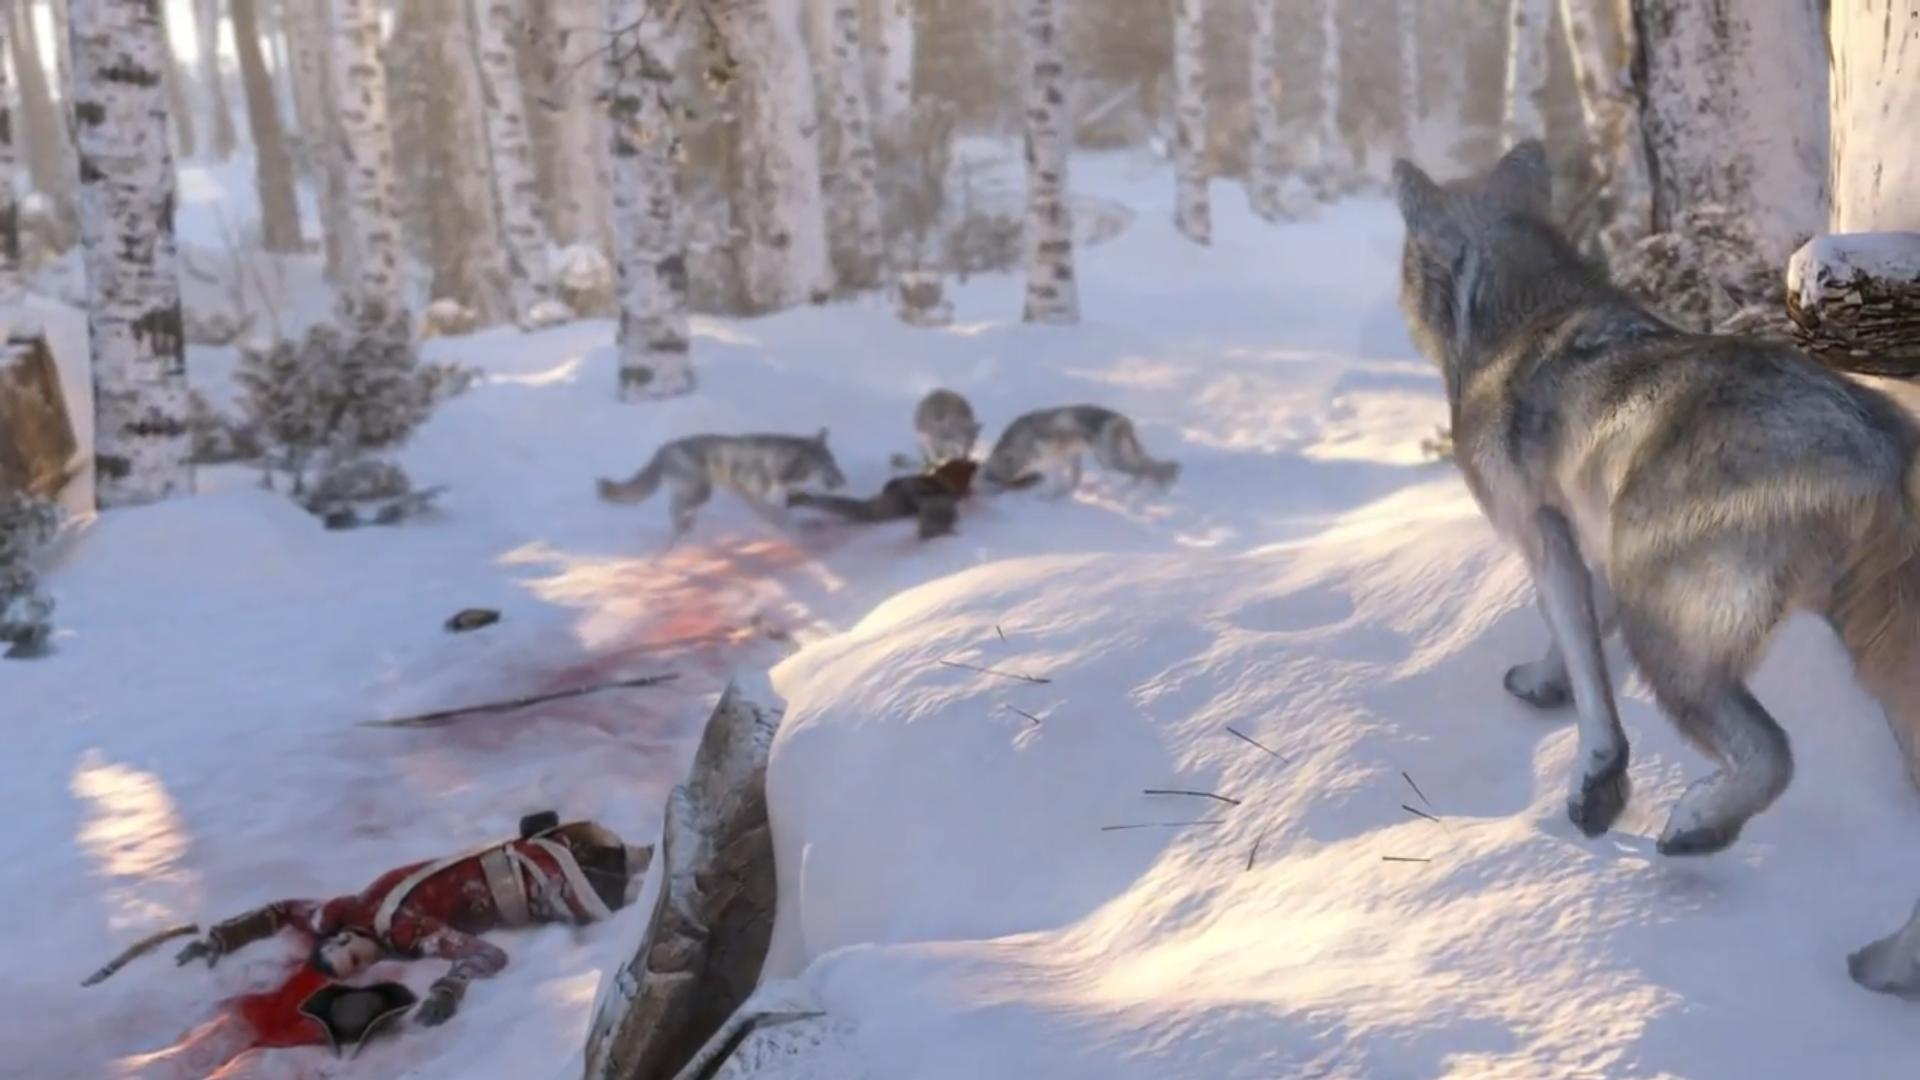 Assassin's Creed 3 - Rozbor prvního traileru 61678